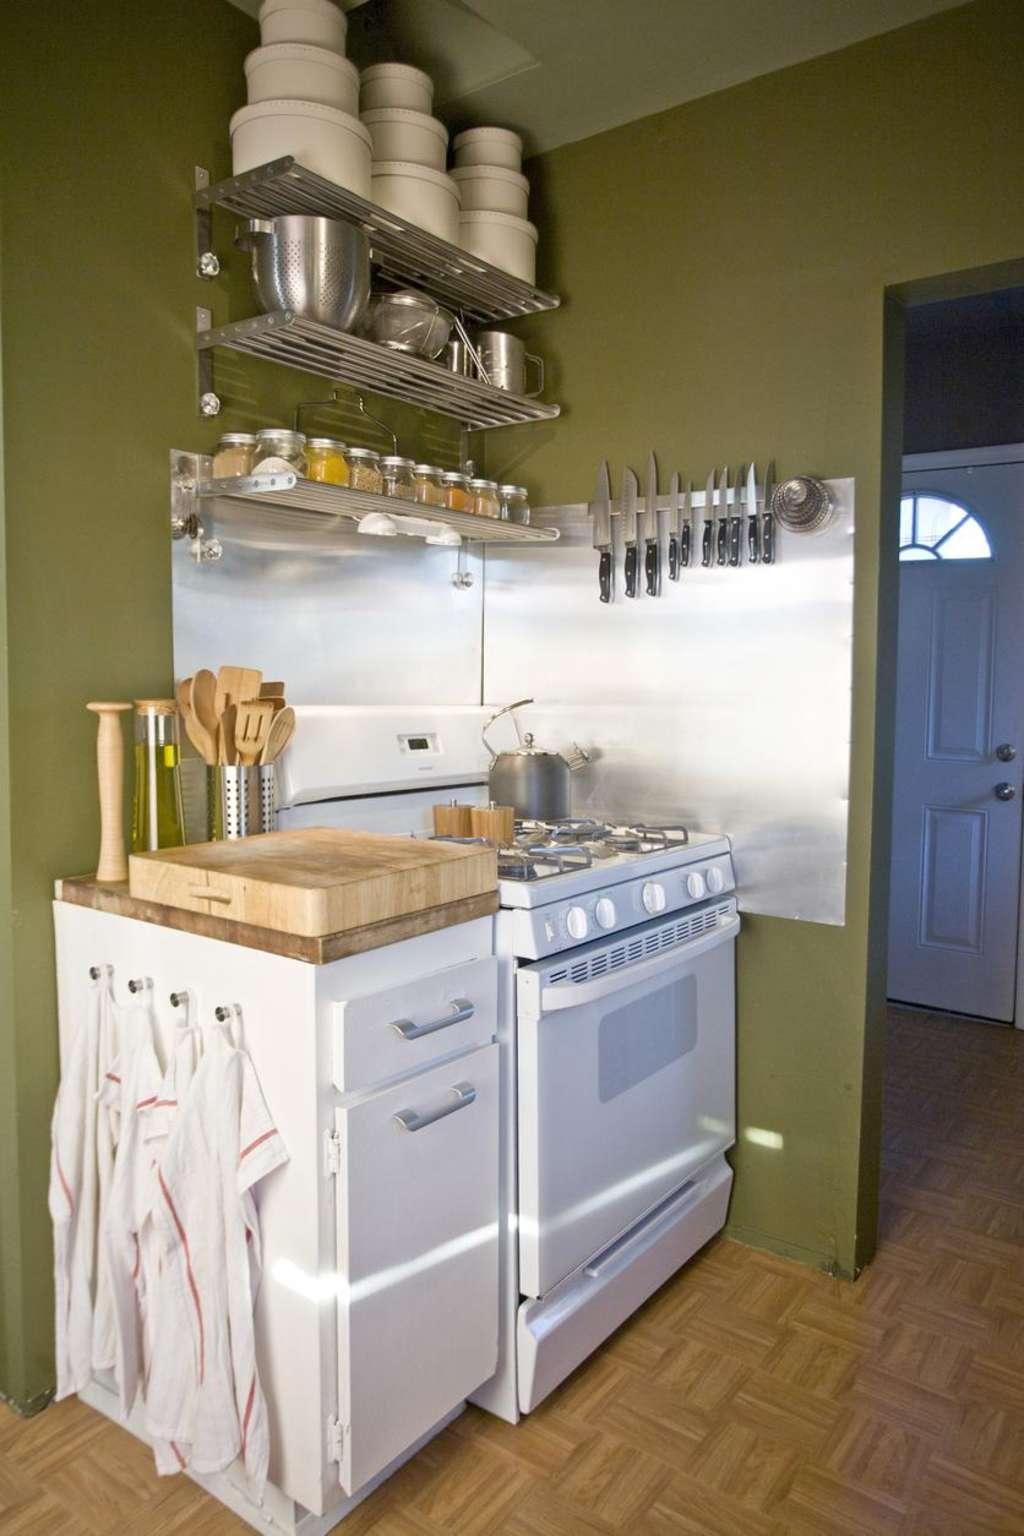 45 Cool Small Balcony Design Ideas: Jaime's Compact California Kitchen